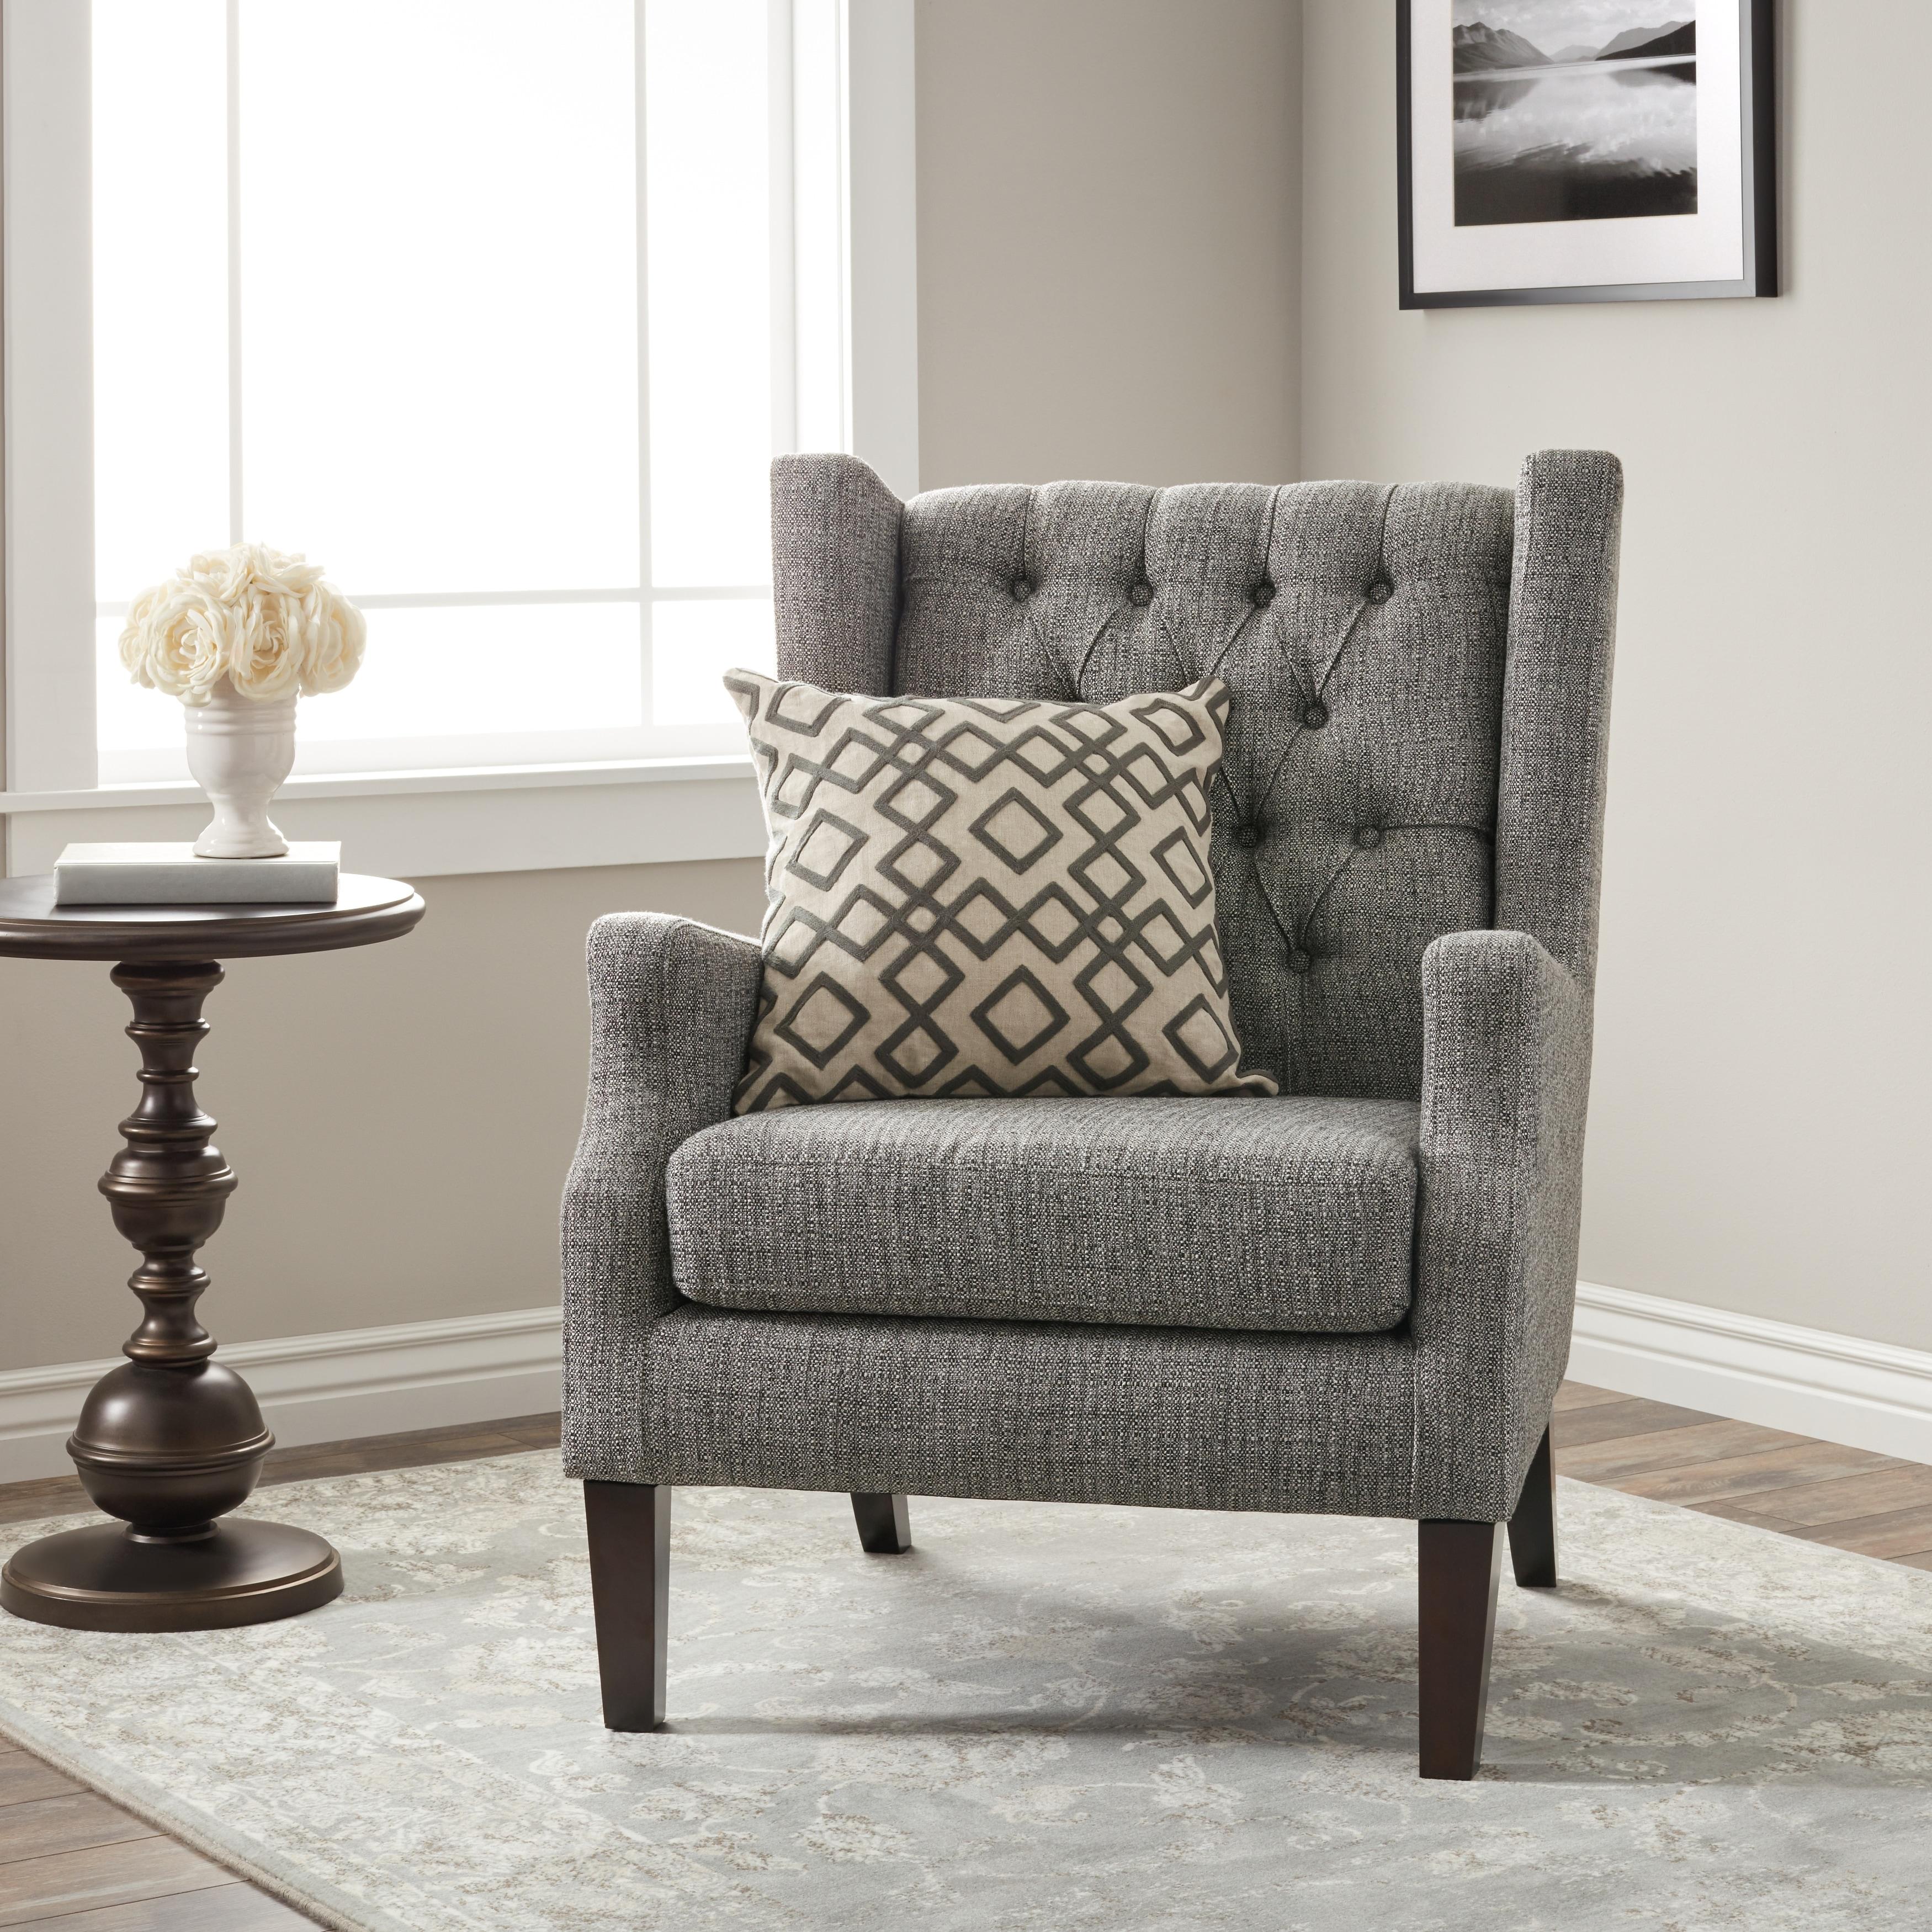 Stones U0026 Stripes Maxwell Grey Tufted Wingback Chair